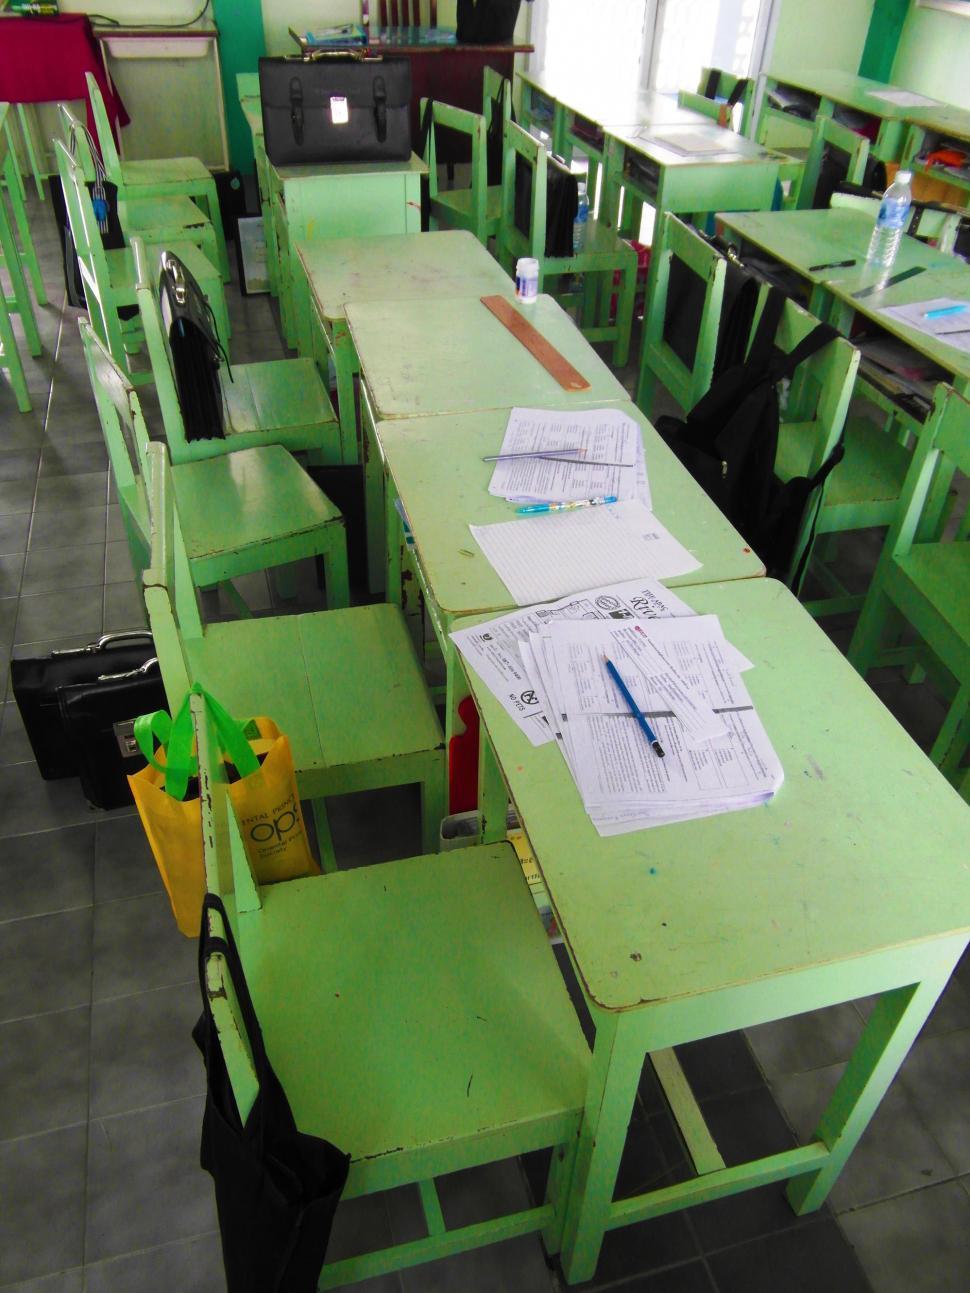 Download Free Stock HD Photo of Classroom Desks Online